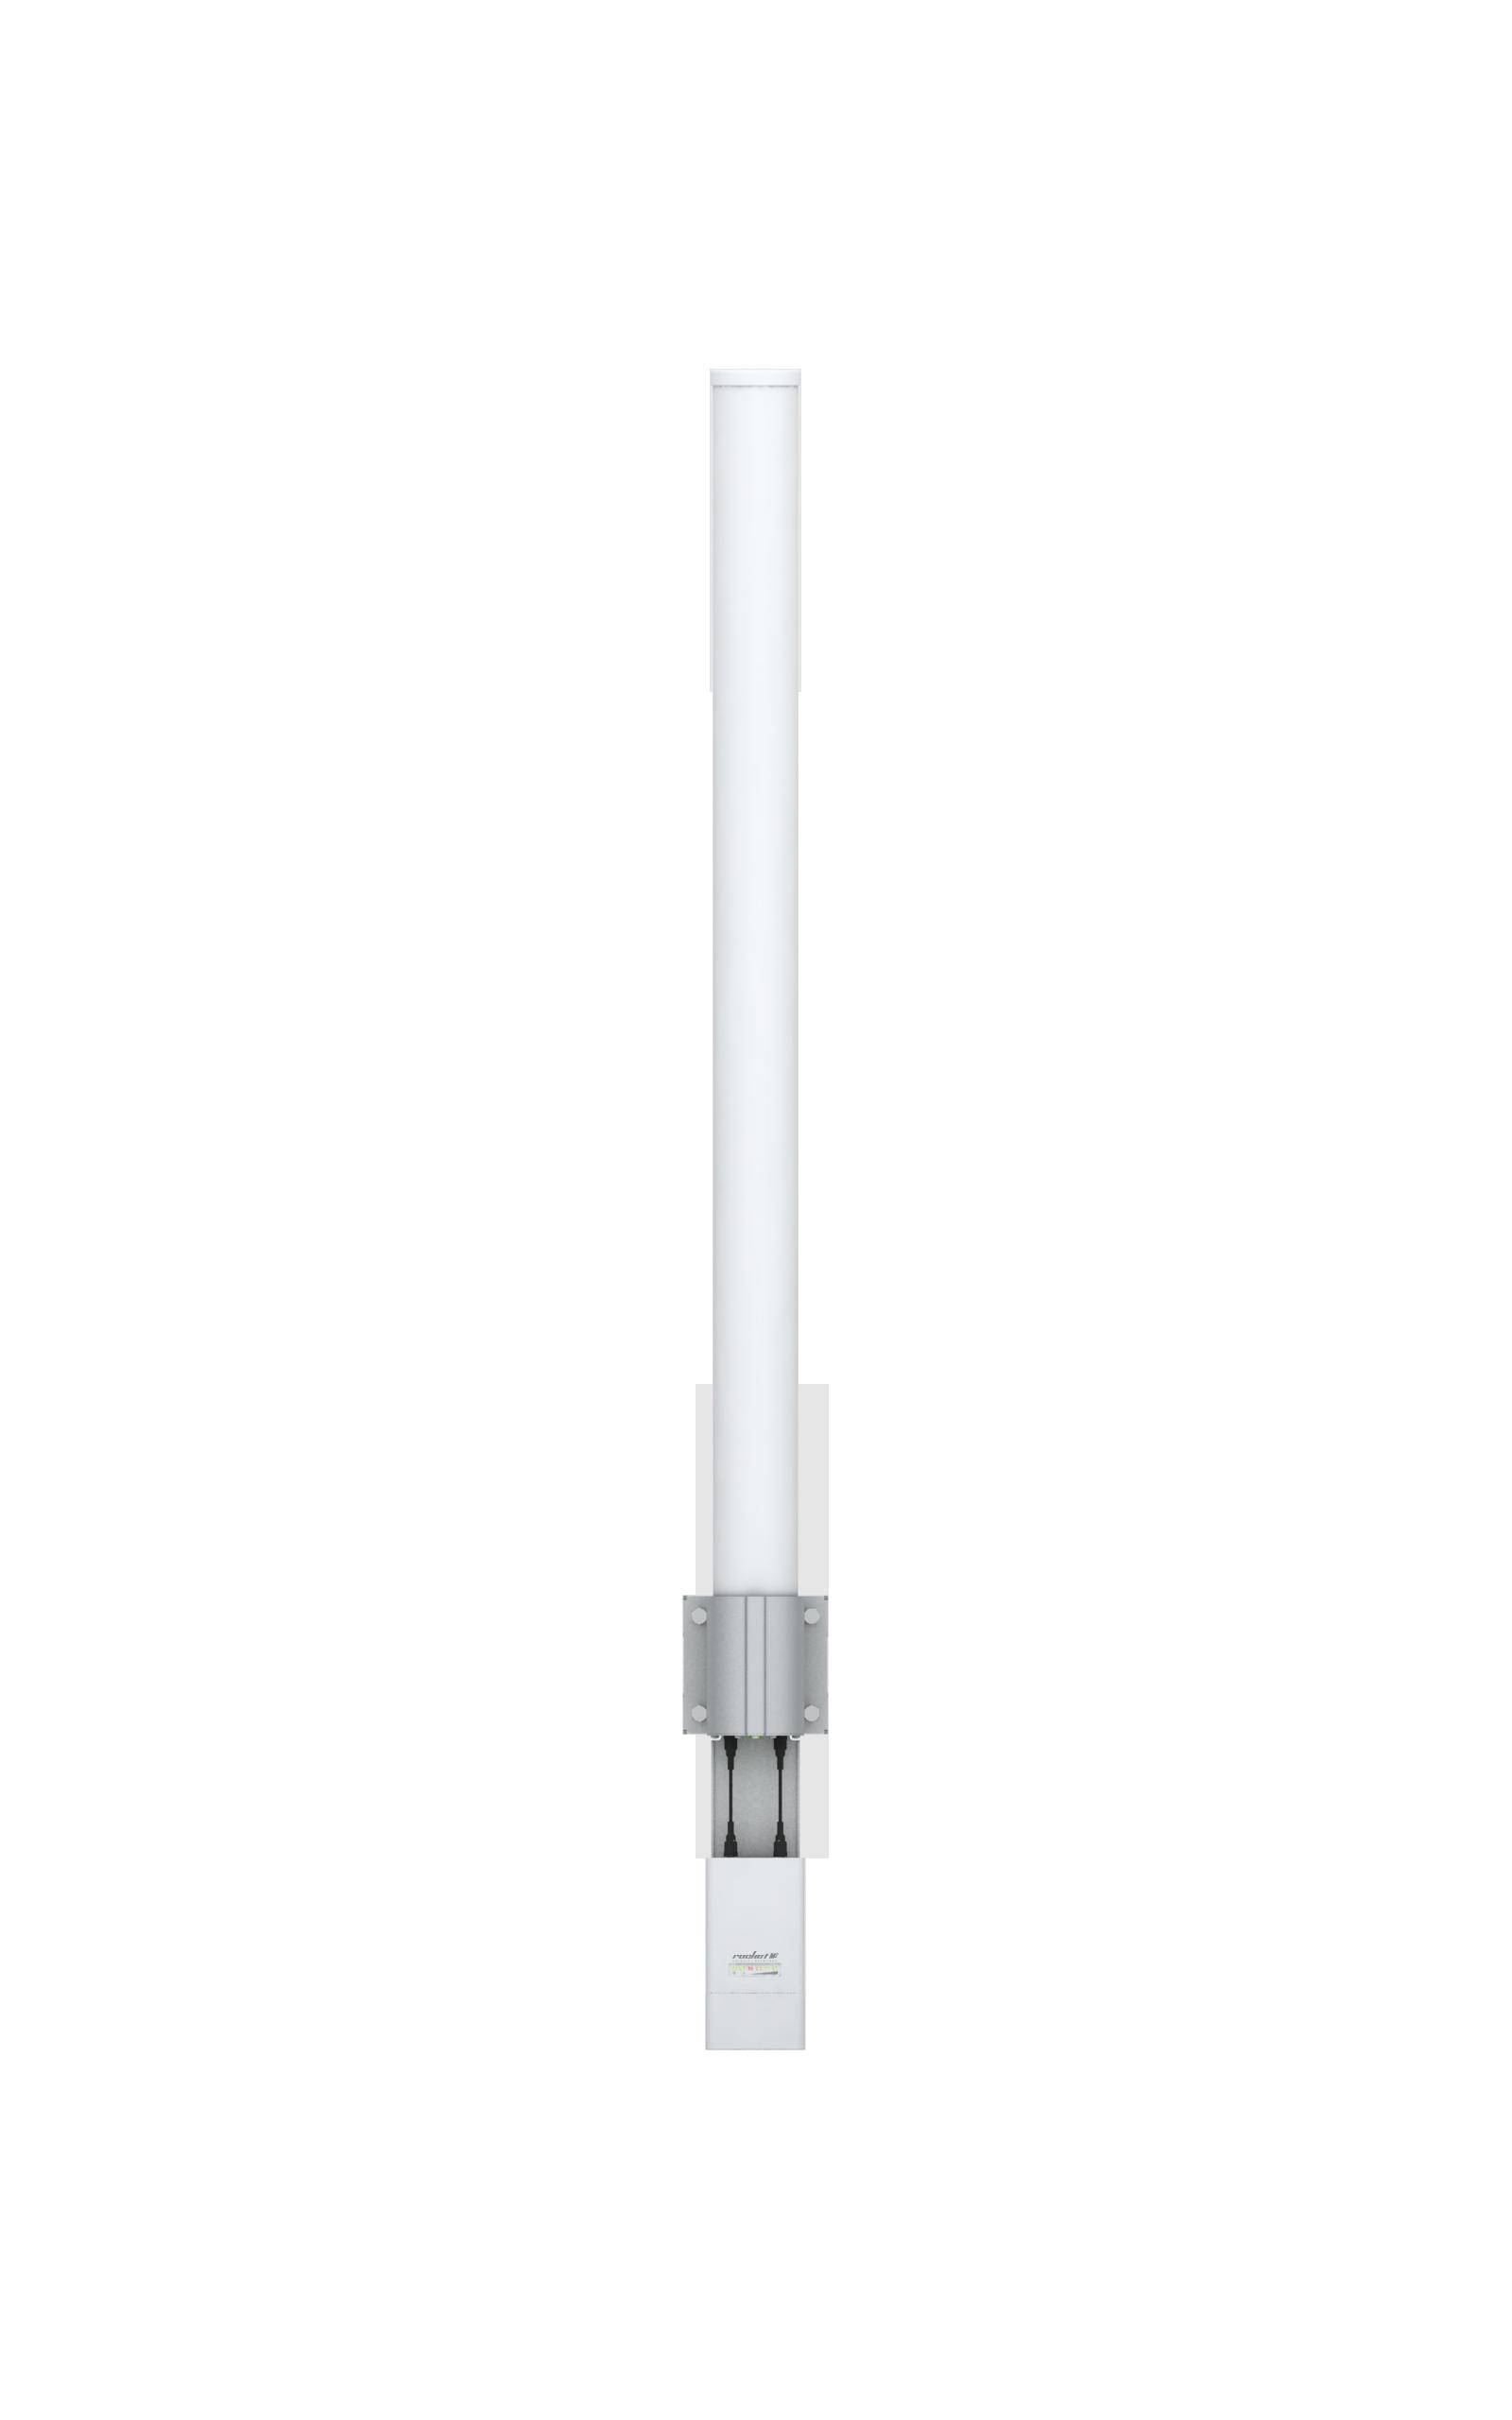 AMO-2G13 Ubiquiti 2.4 GHz AirMax 13dBi 360 Derece Omni Anten